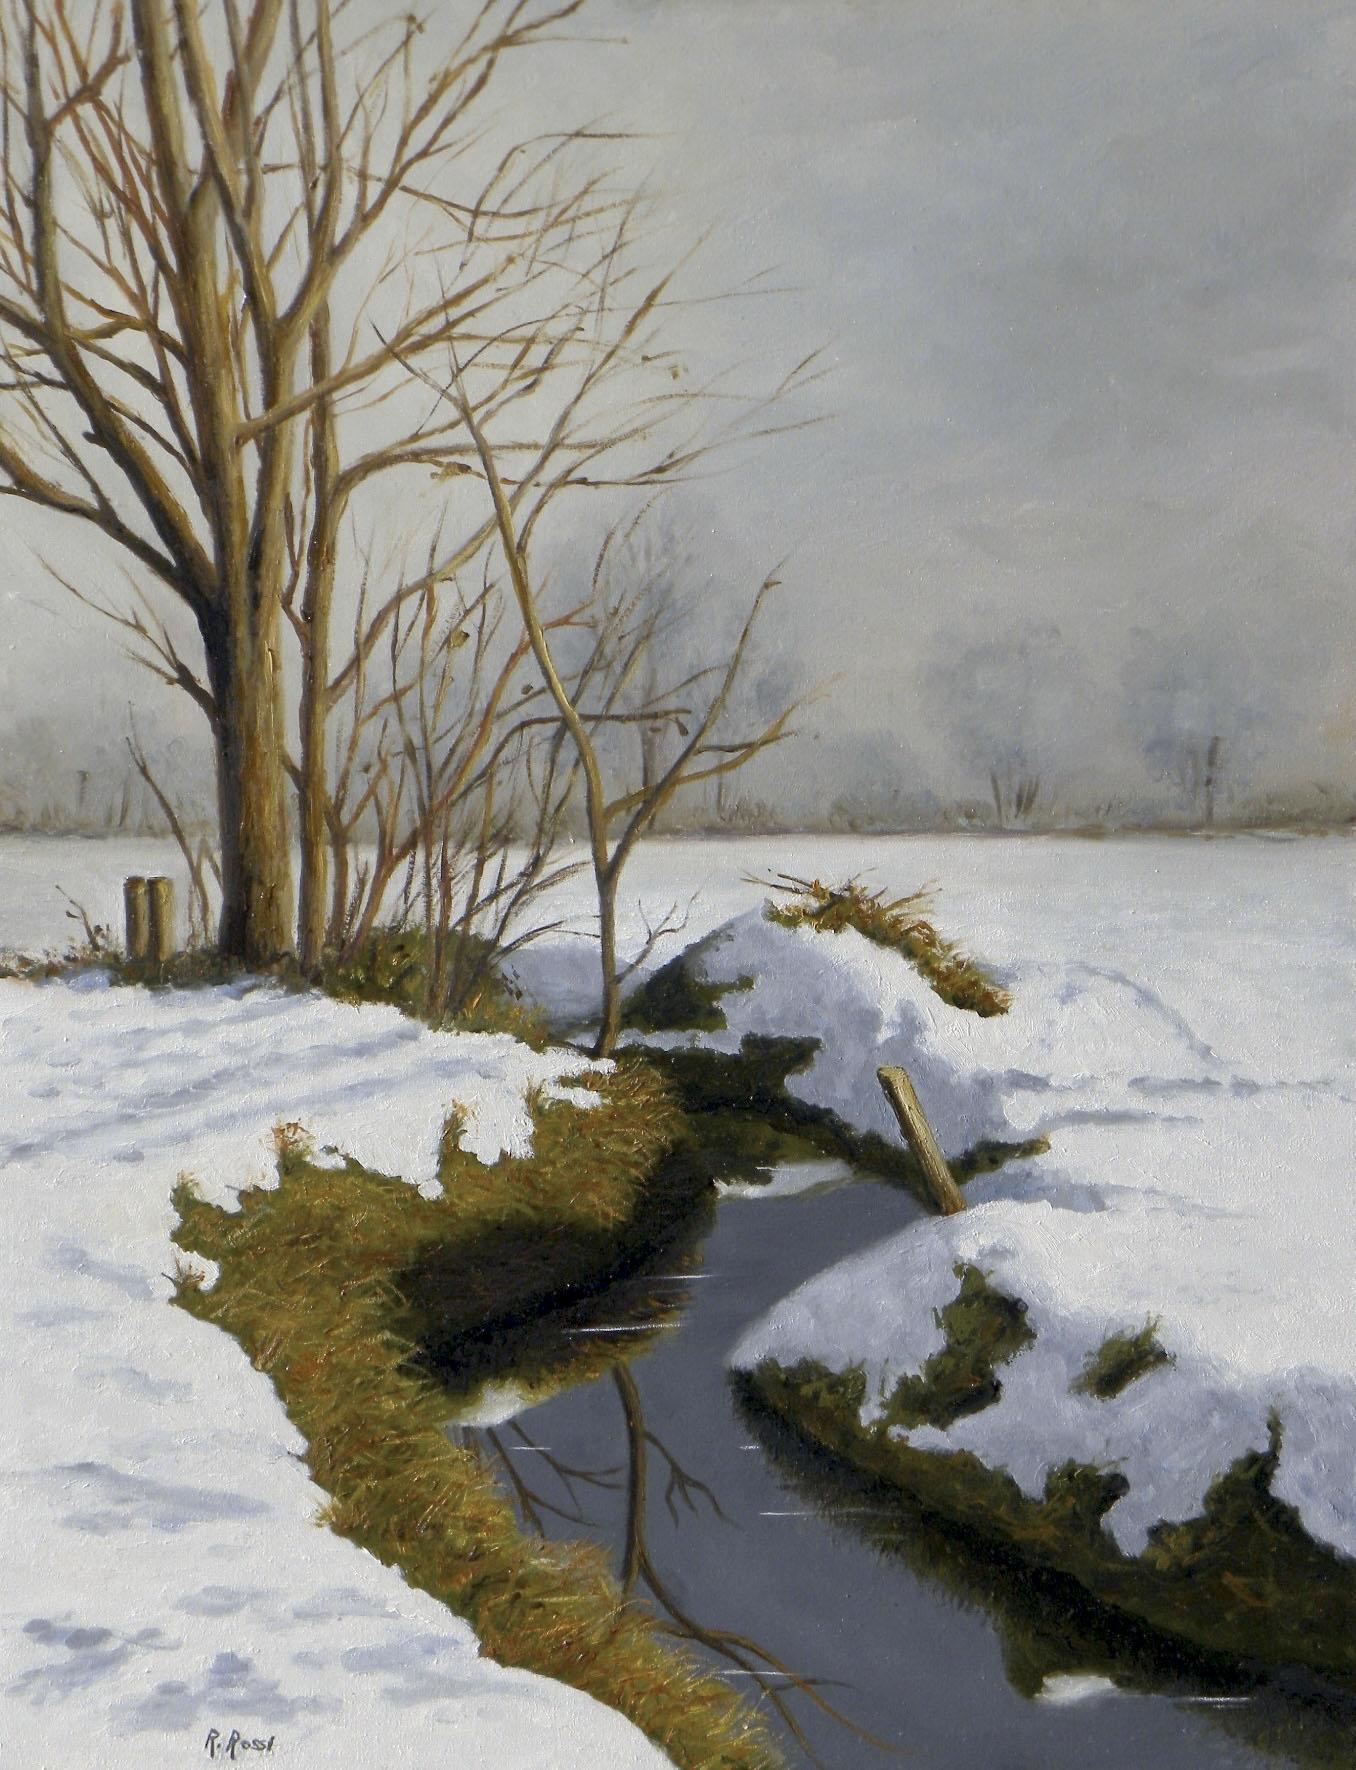 2009 roberta rossi – Dopo la nevicata – olio su tela – 46 x 35